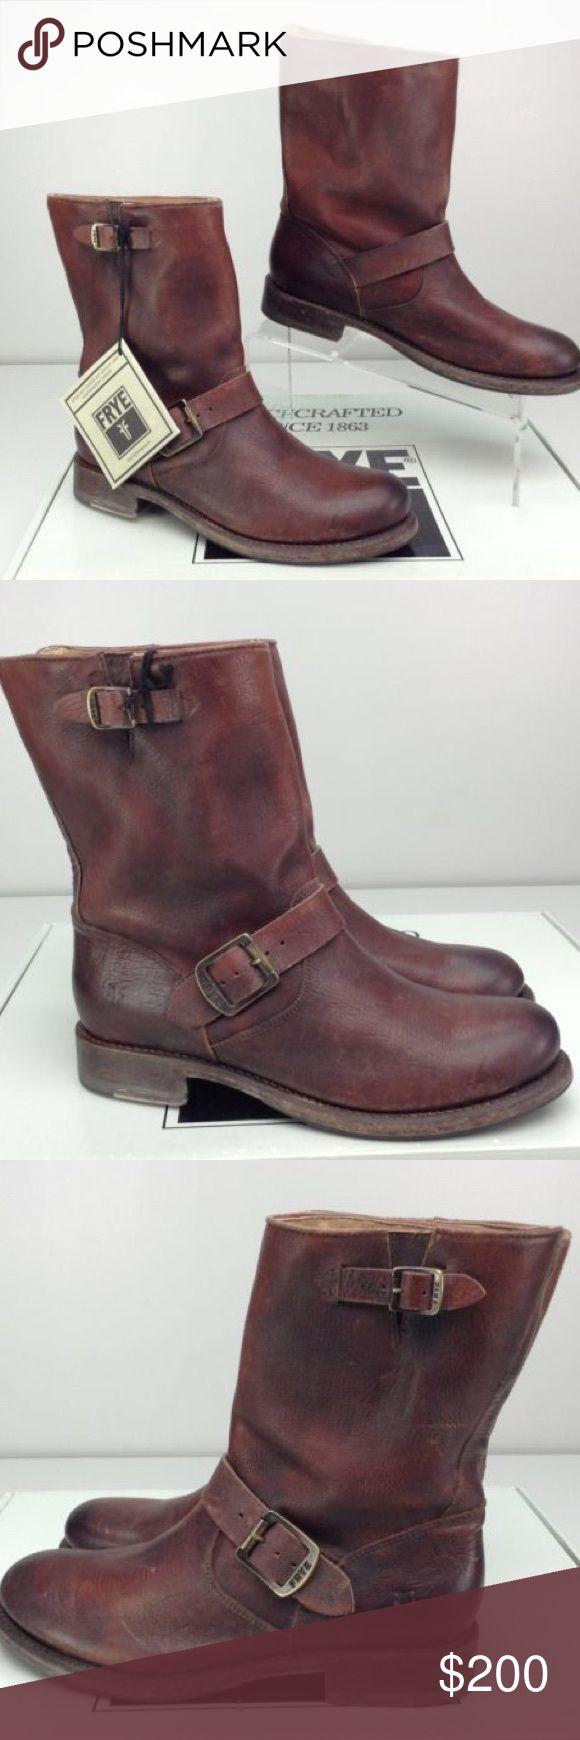 Frye Veronica Short Worn twice! Make your best offer 😊 Frye Shoes